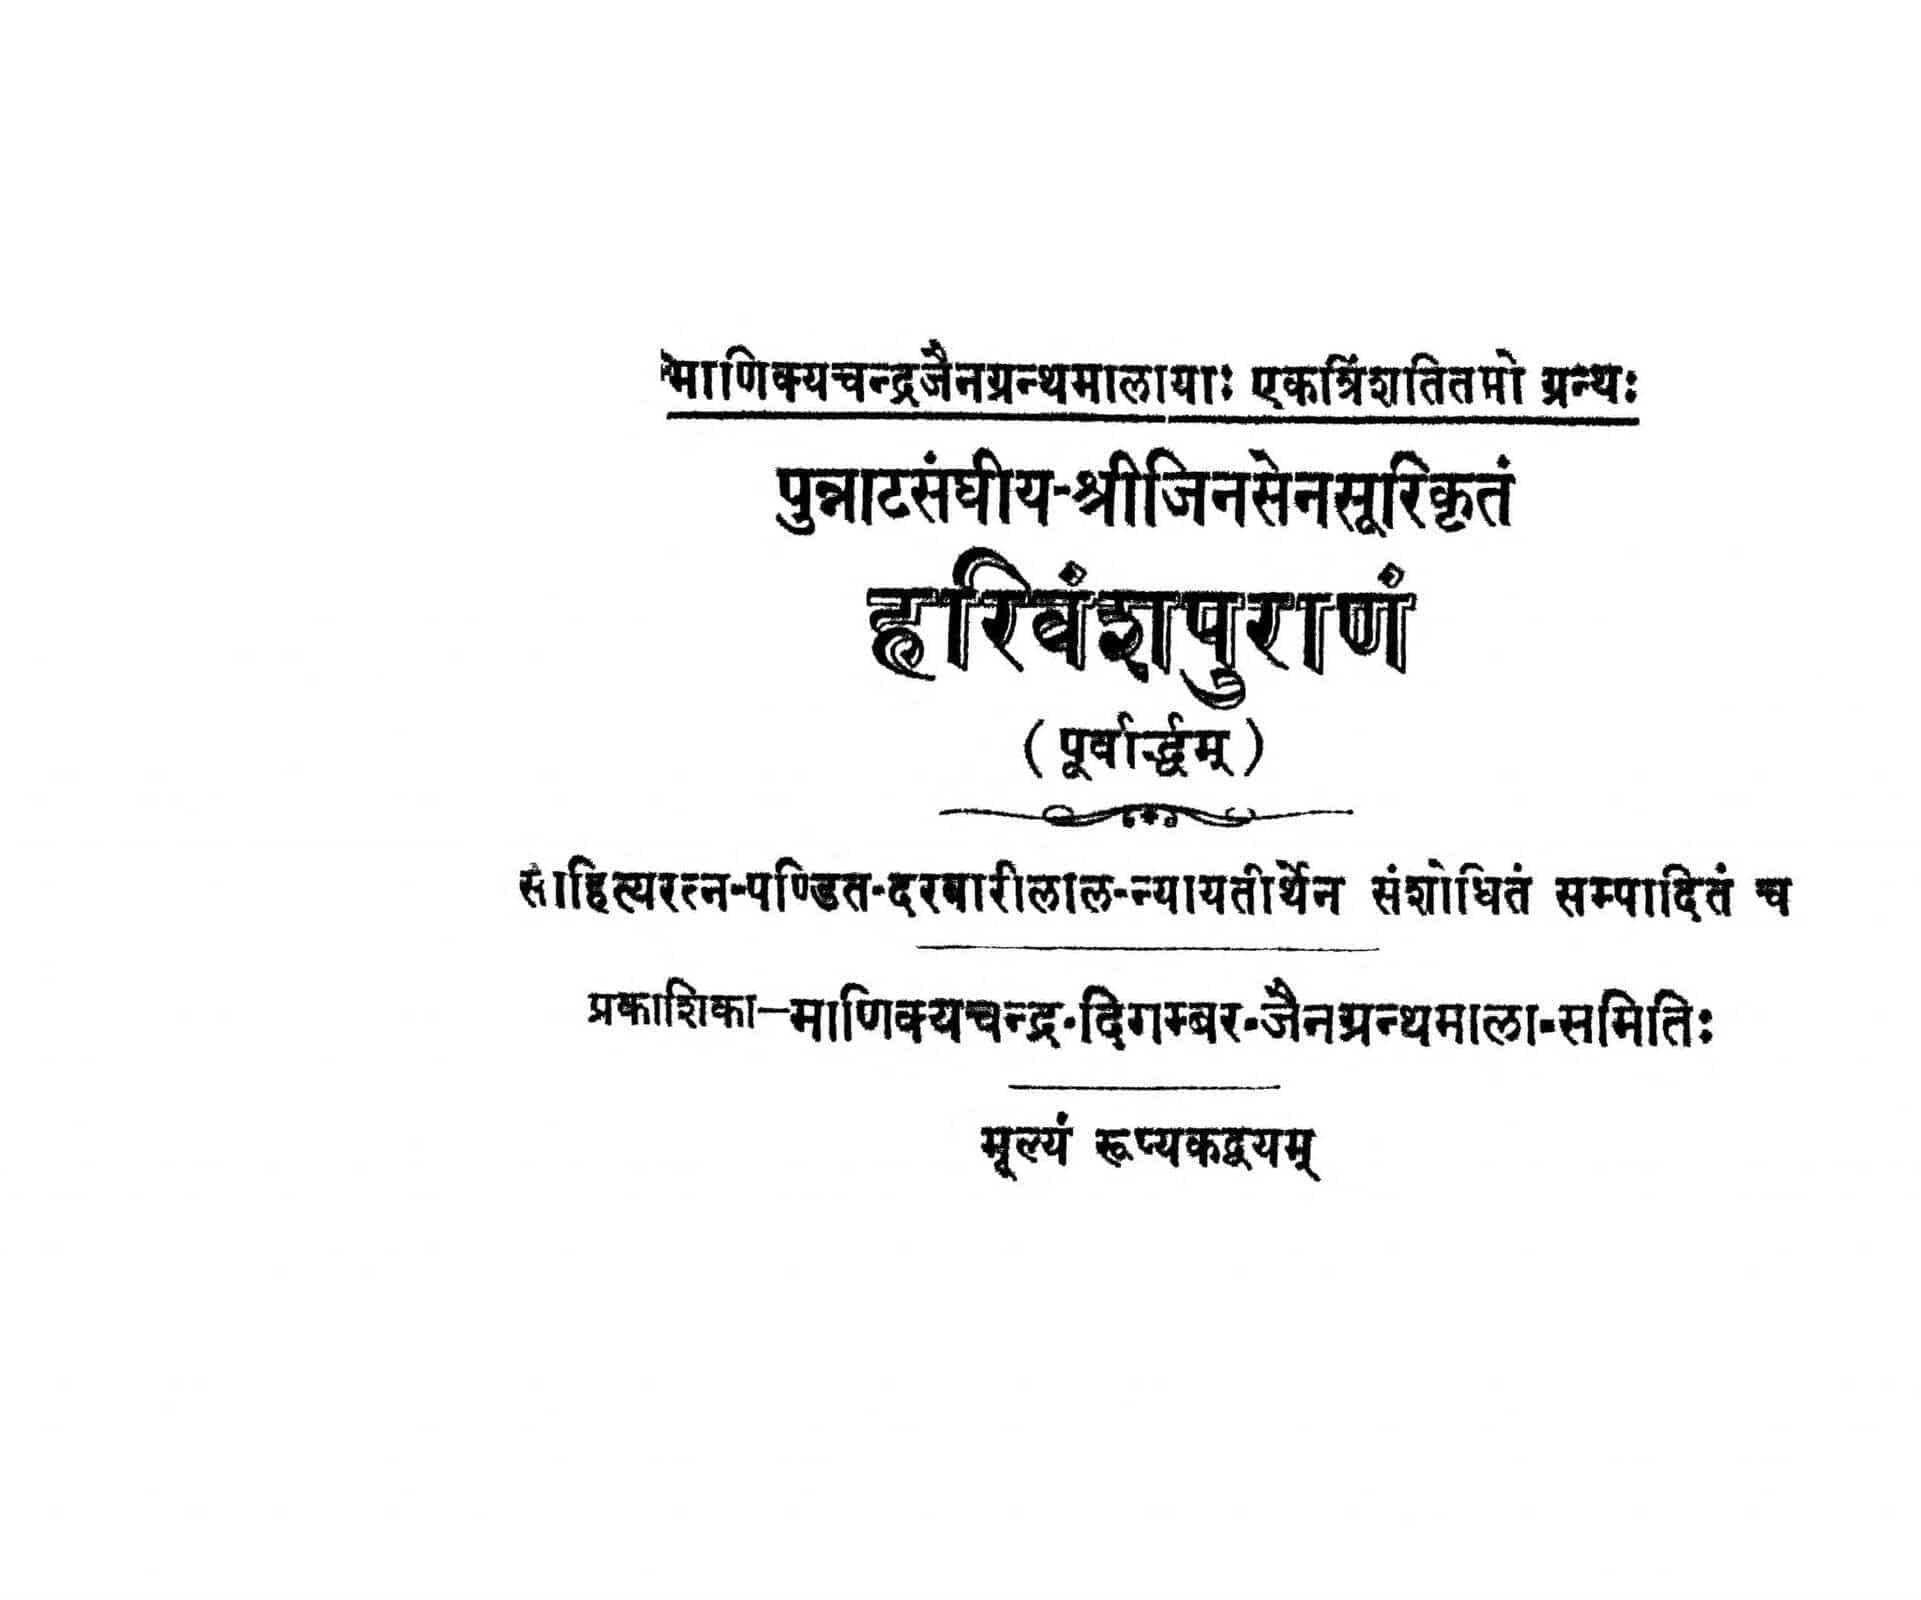 Harivanshpuranam by नाथूराम प्रेमी - Nathuram Premi